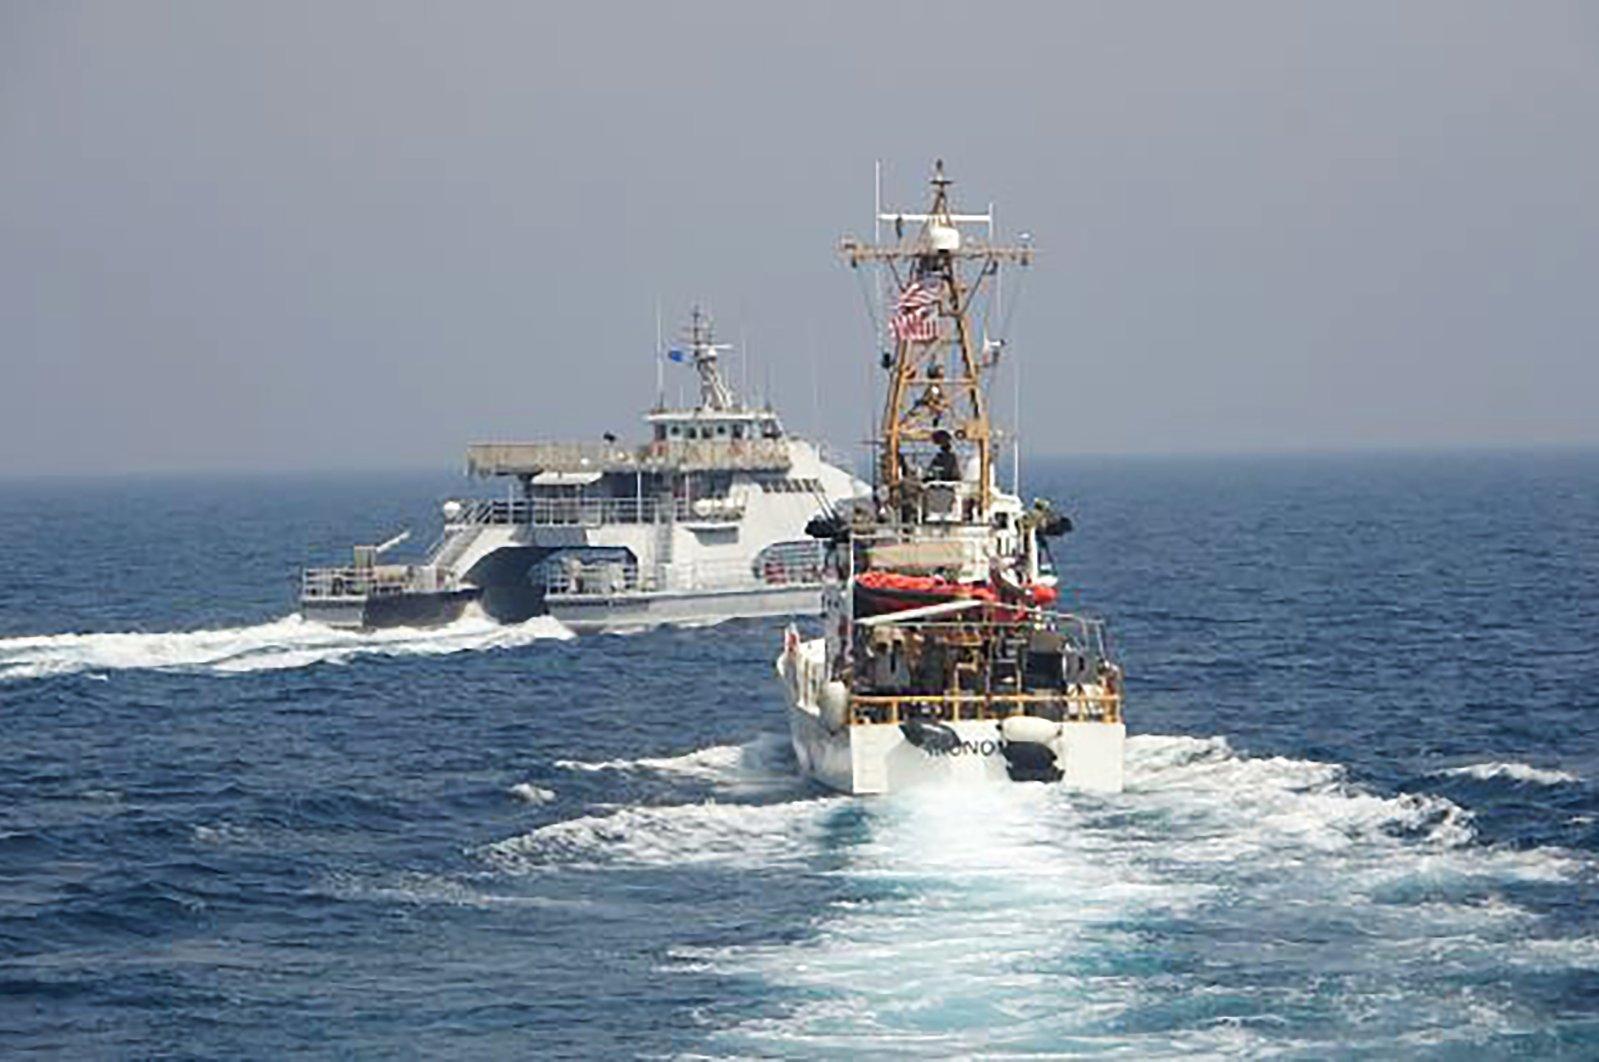 An Iranian Revolutionary Guard vessel cuts in front of the U.S. Coast Guard ship USCGC Monomoy in the Persian Gulf, April 2, 2021, (U.S. Navy via AP Photo)